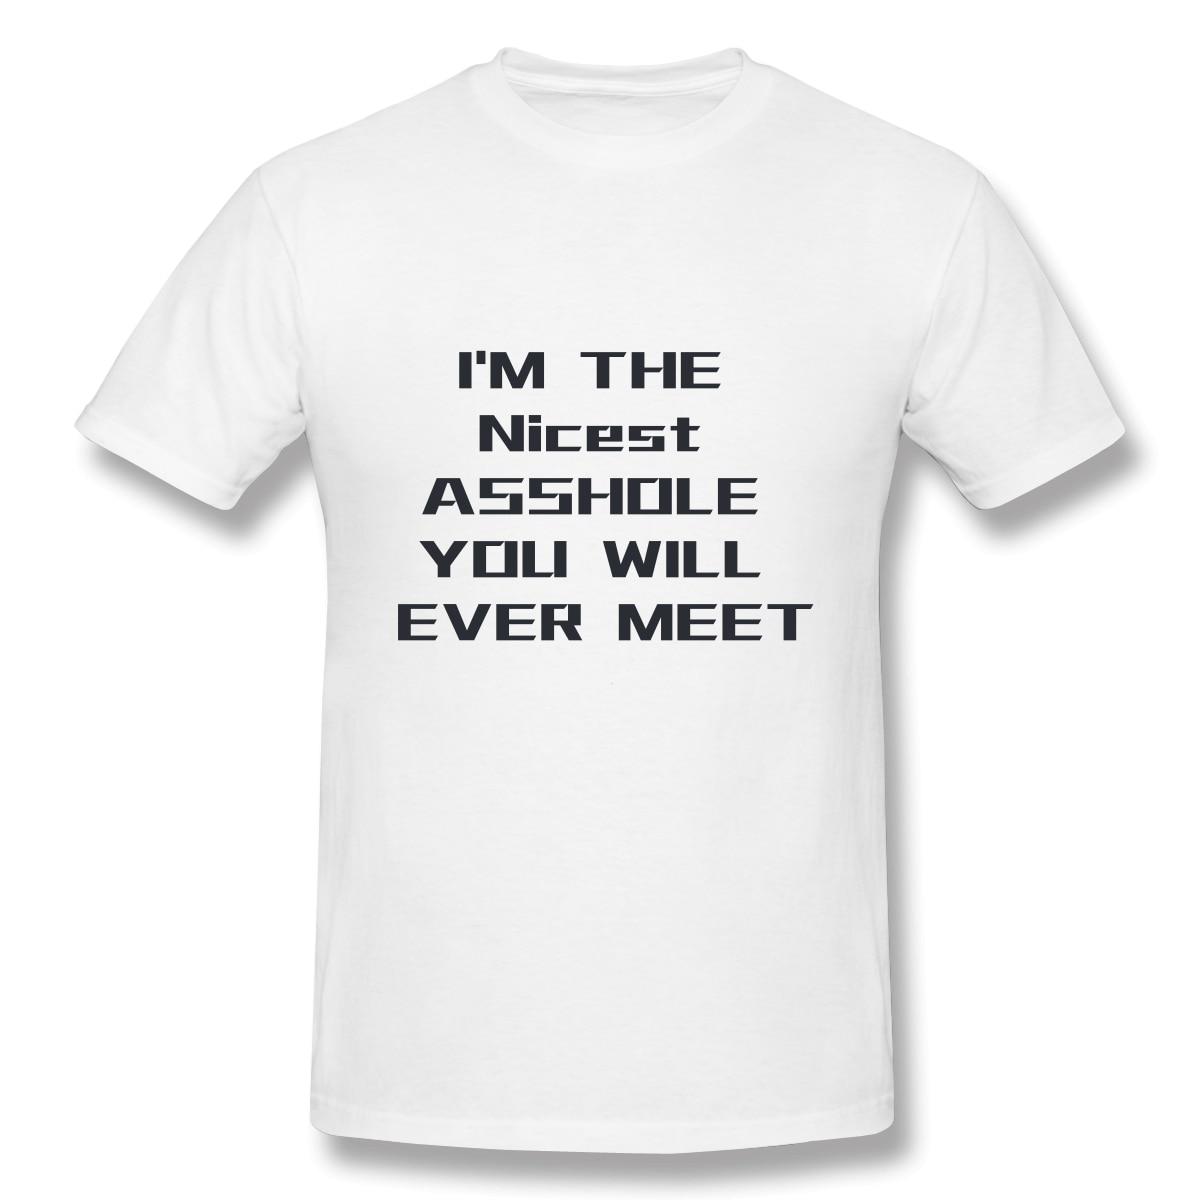 Rude Shirts Men Cool Mens Shirt Crazy Shirt Nice Guy Gifts Funny Shirt For Men Shirt For Asshole Sarcastic T Shirt Asshole Shirt